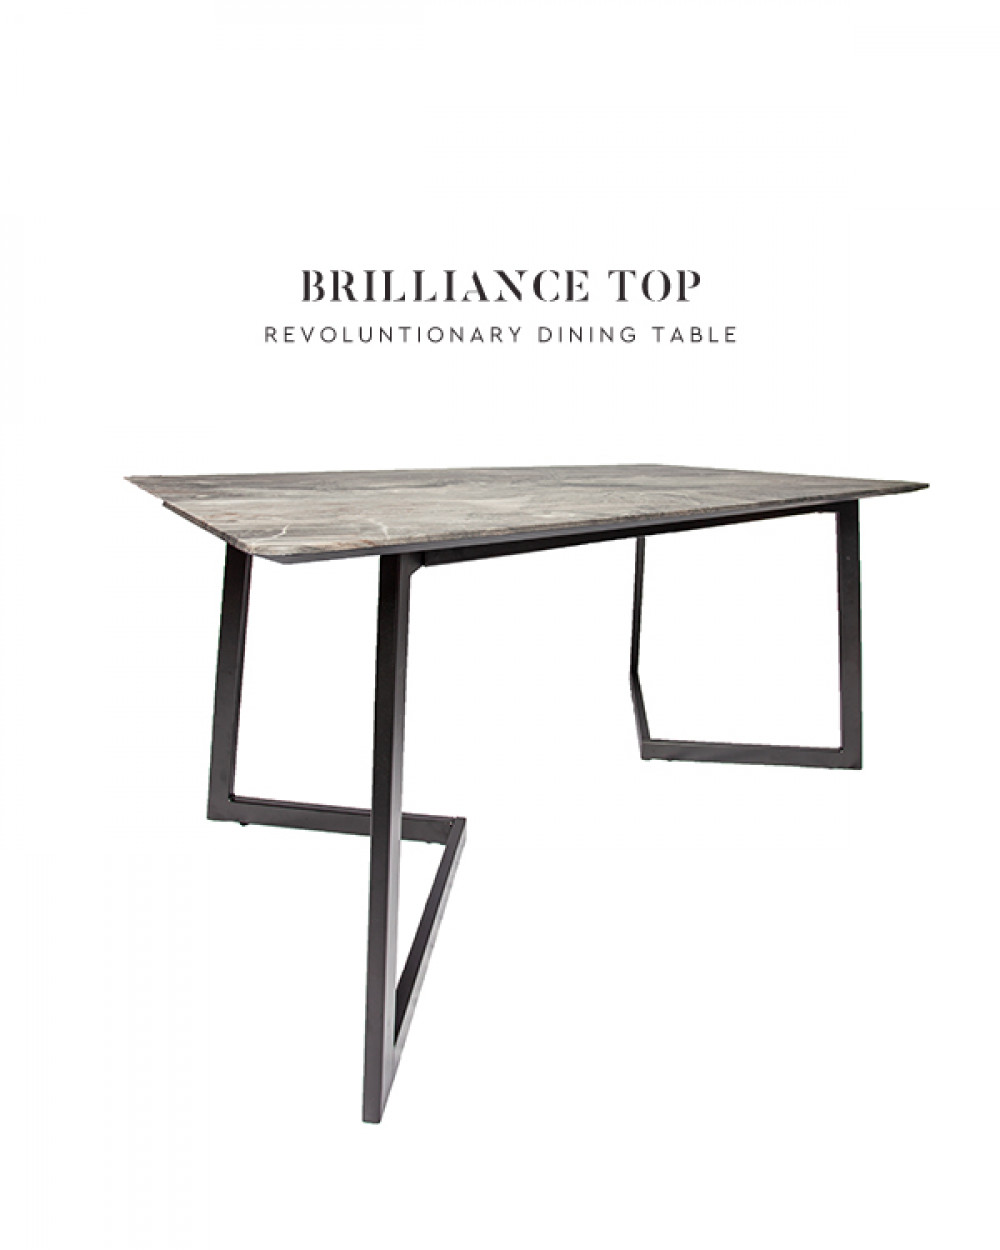 Brilliance Top | Brampton Dining Table